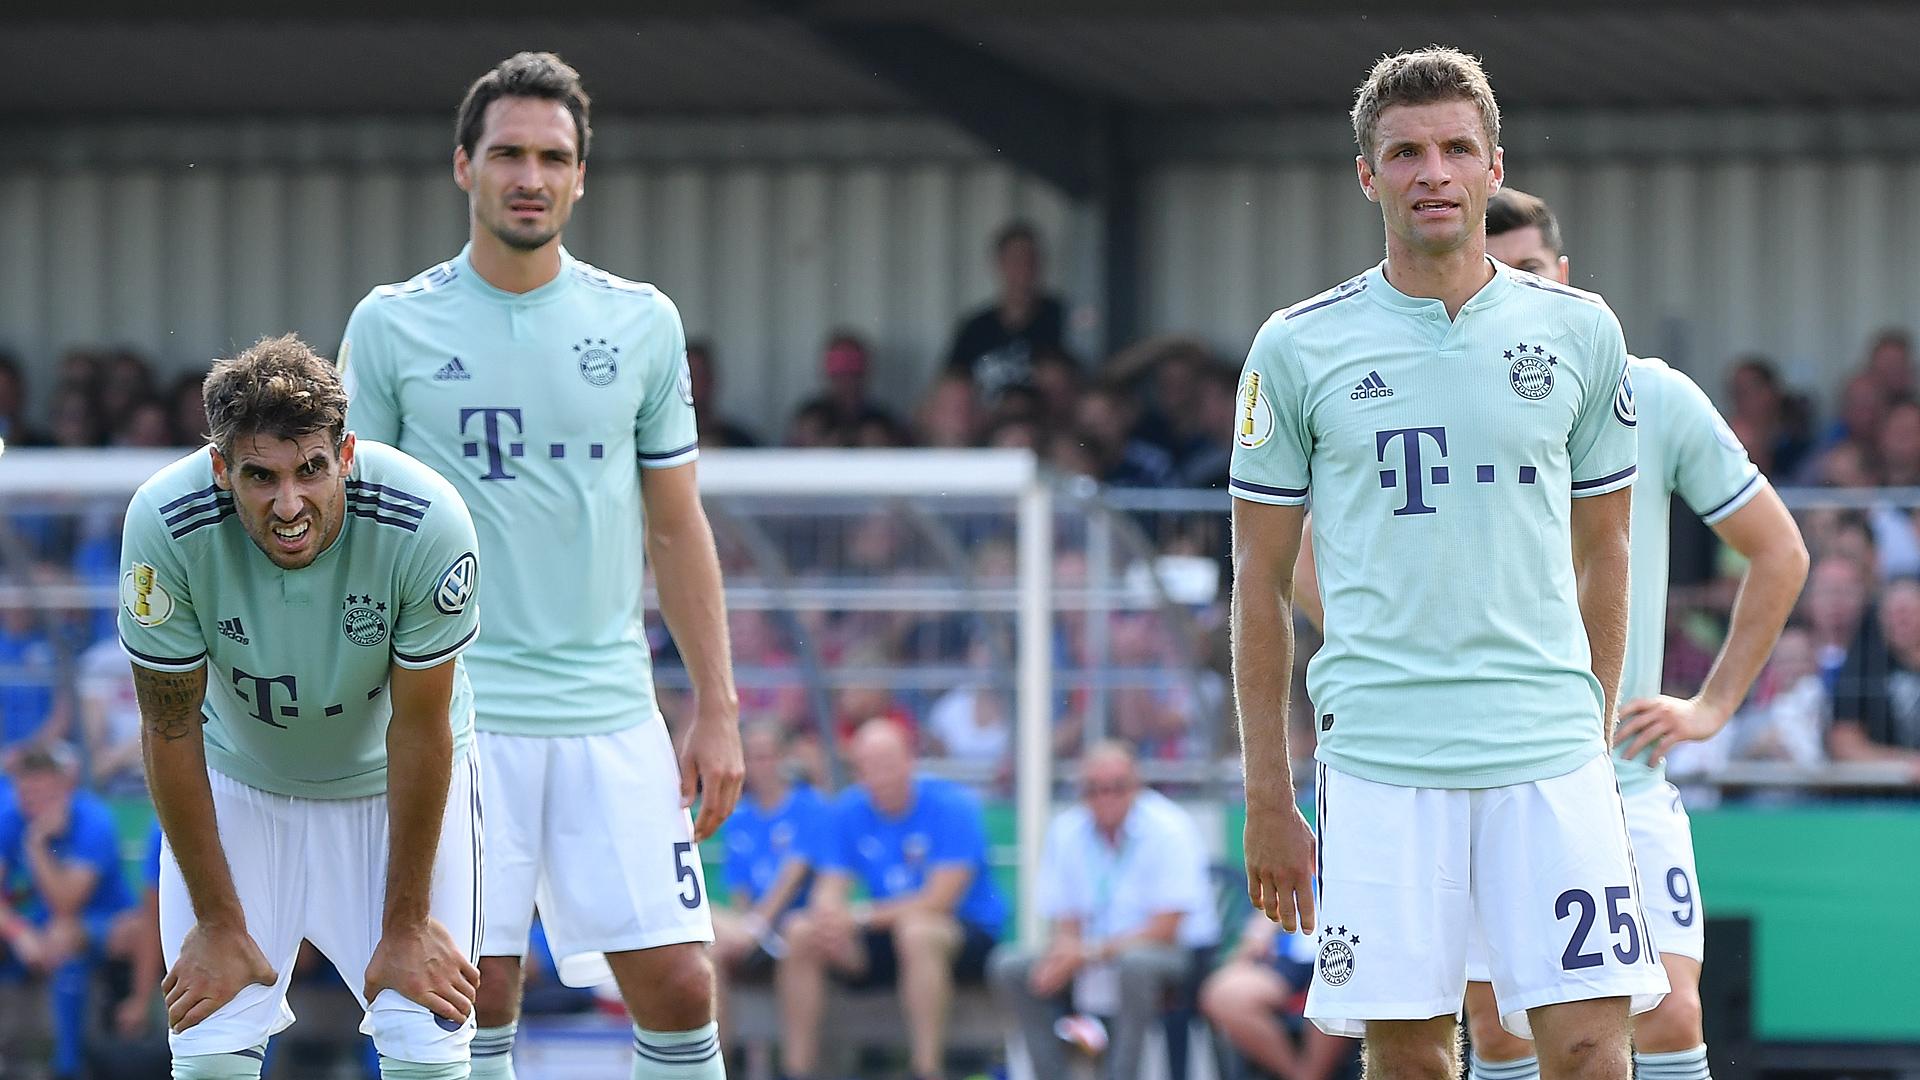 FC Bayern Drochtersen